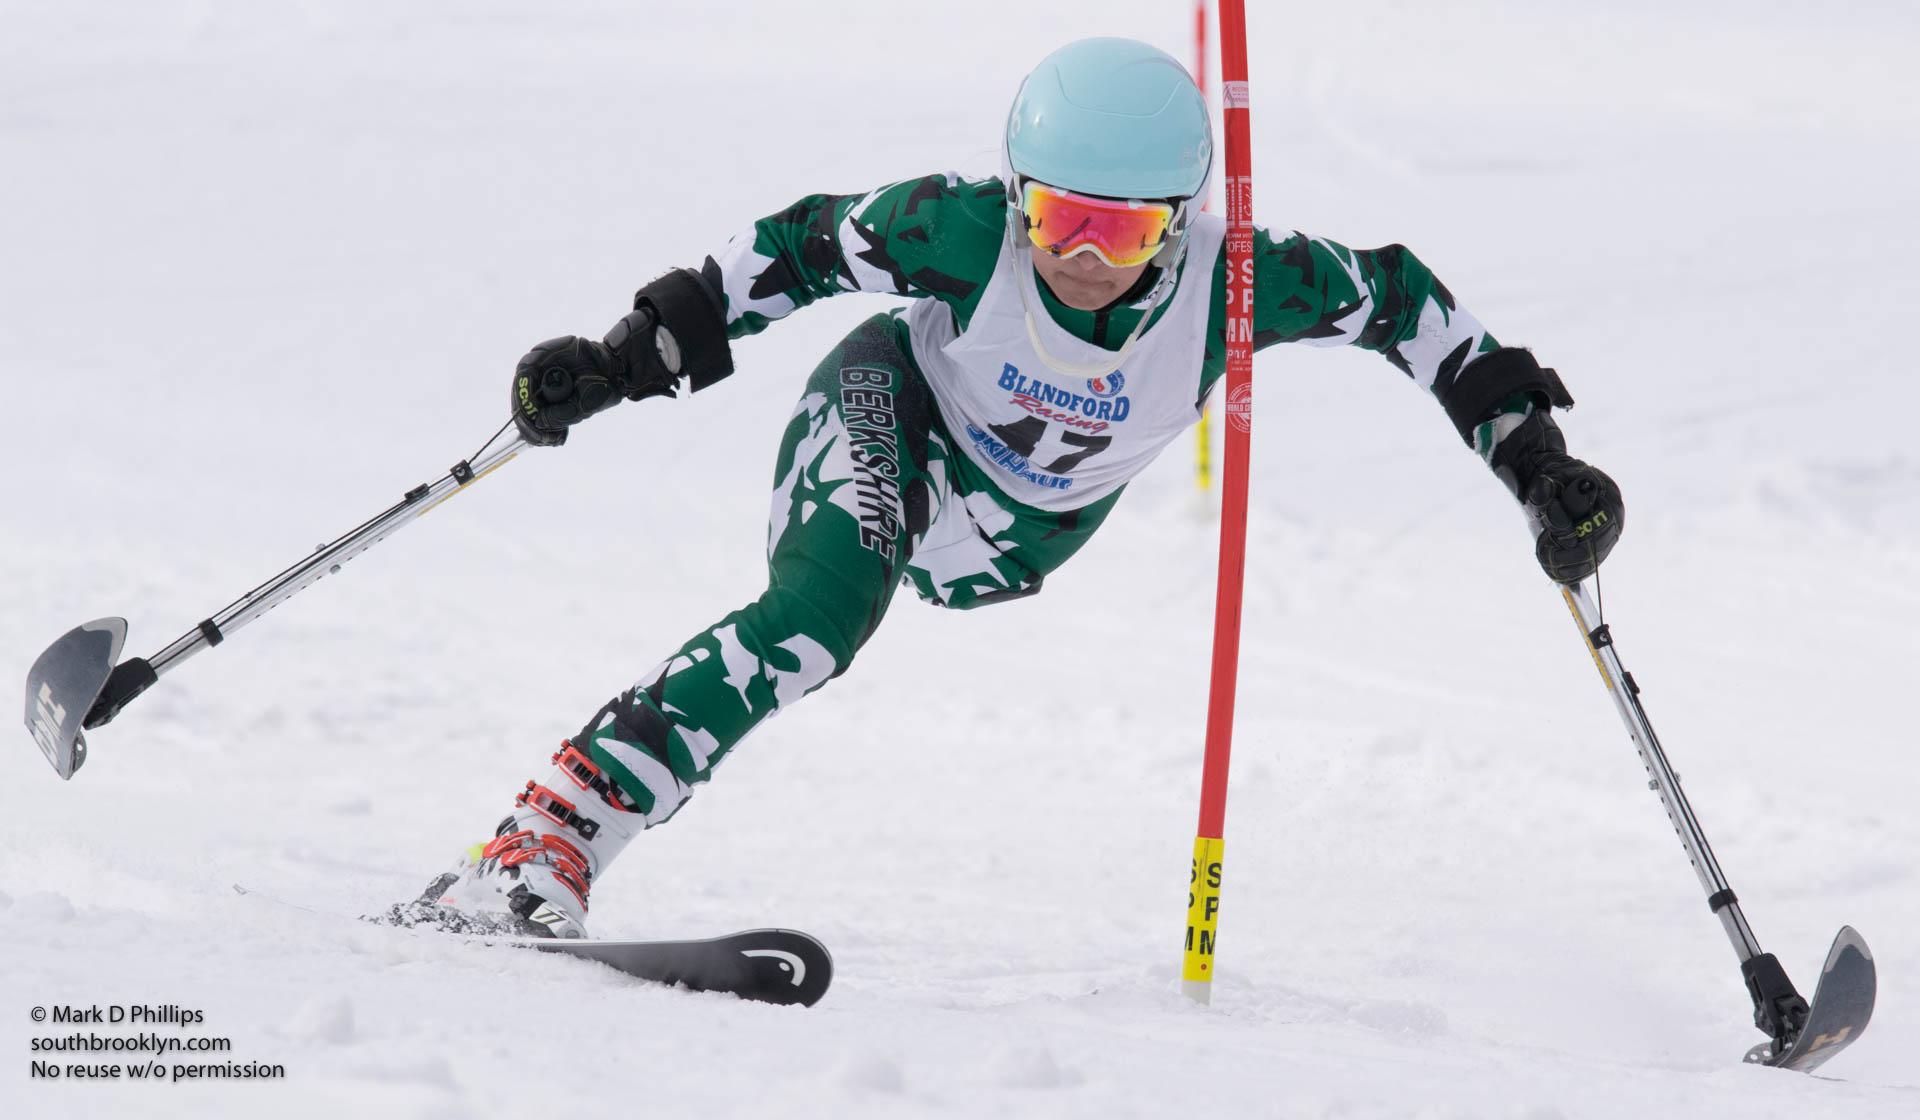 Insha Afsar of BSST at U19 Race at Blandford Ski Area on January 30, 2016